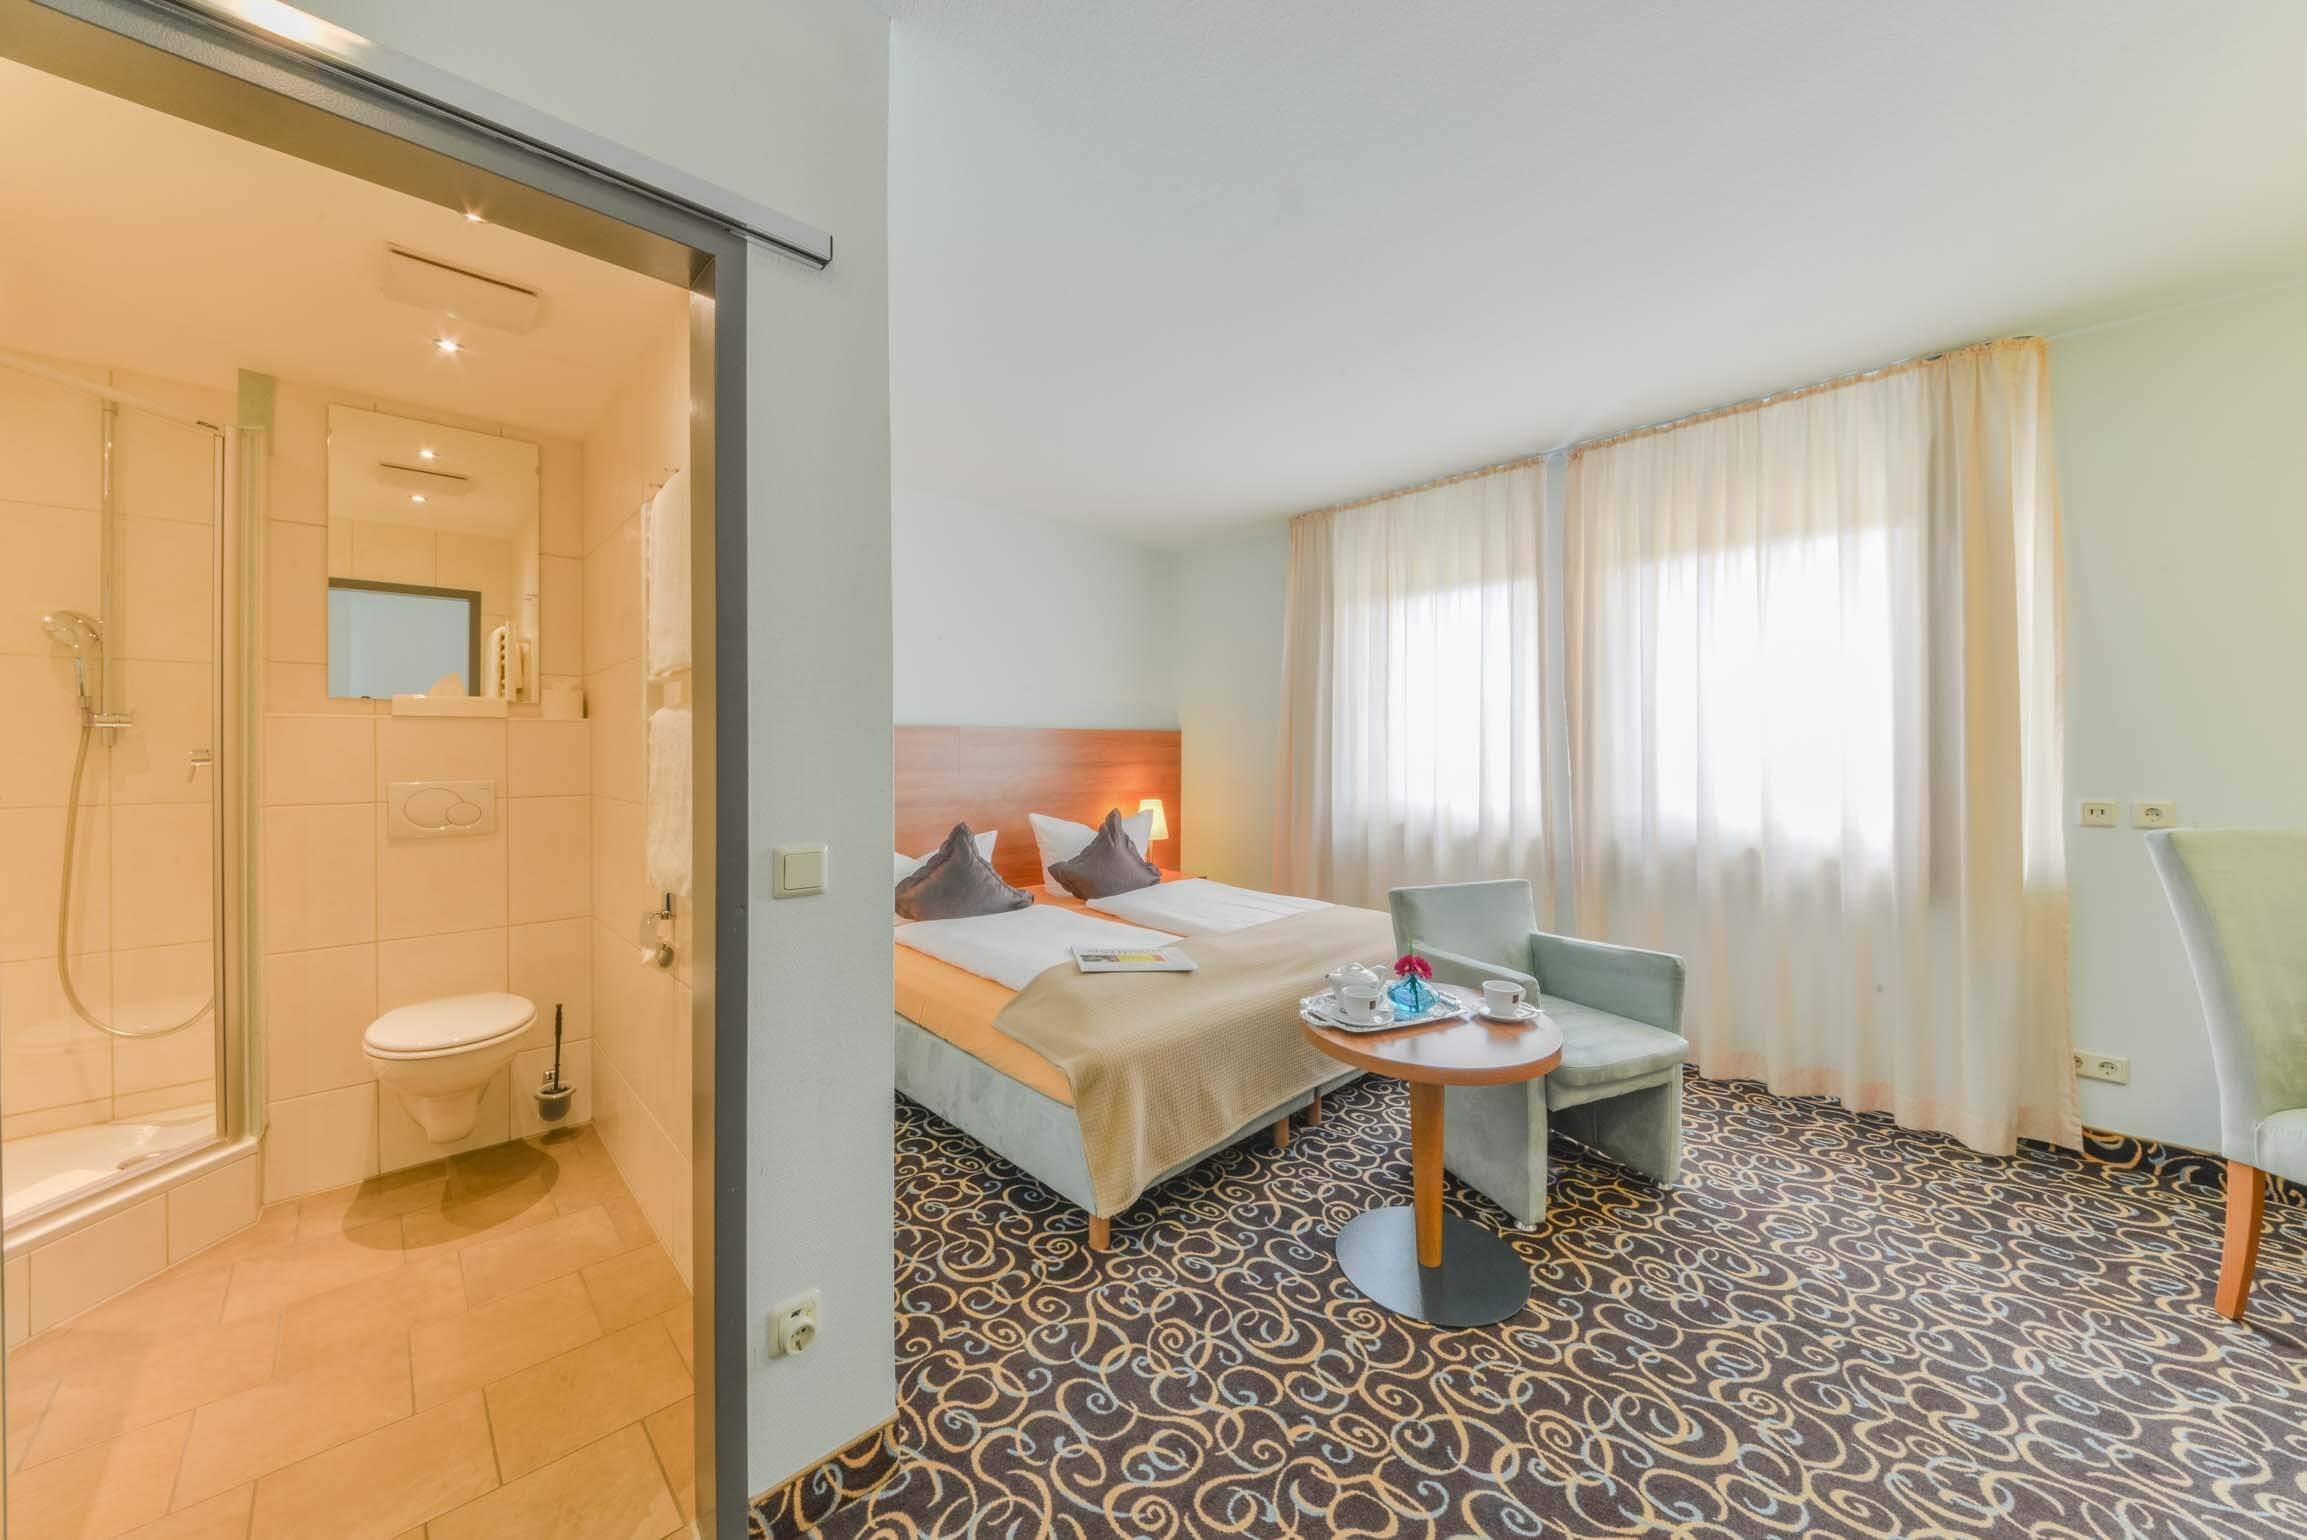 Hotel Ateck Doppelzimmer